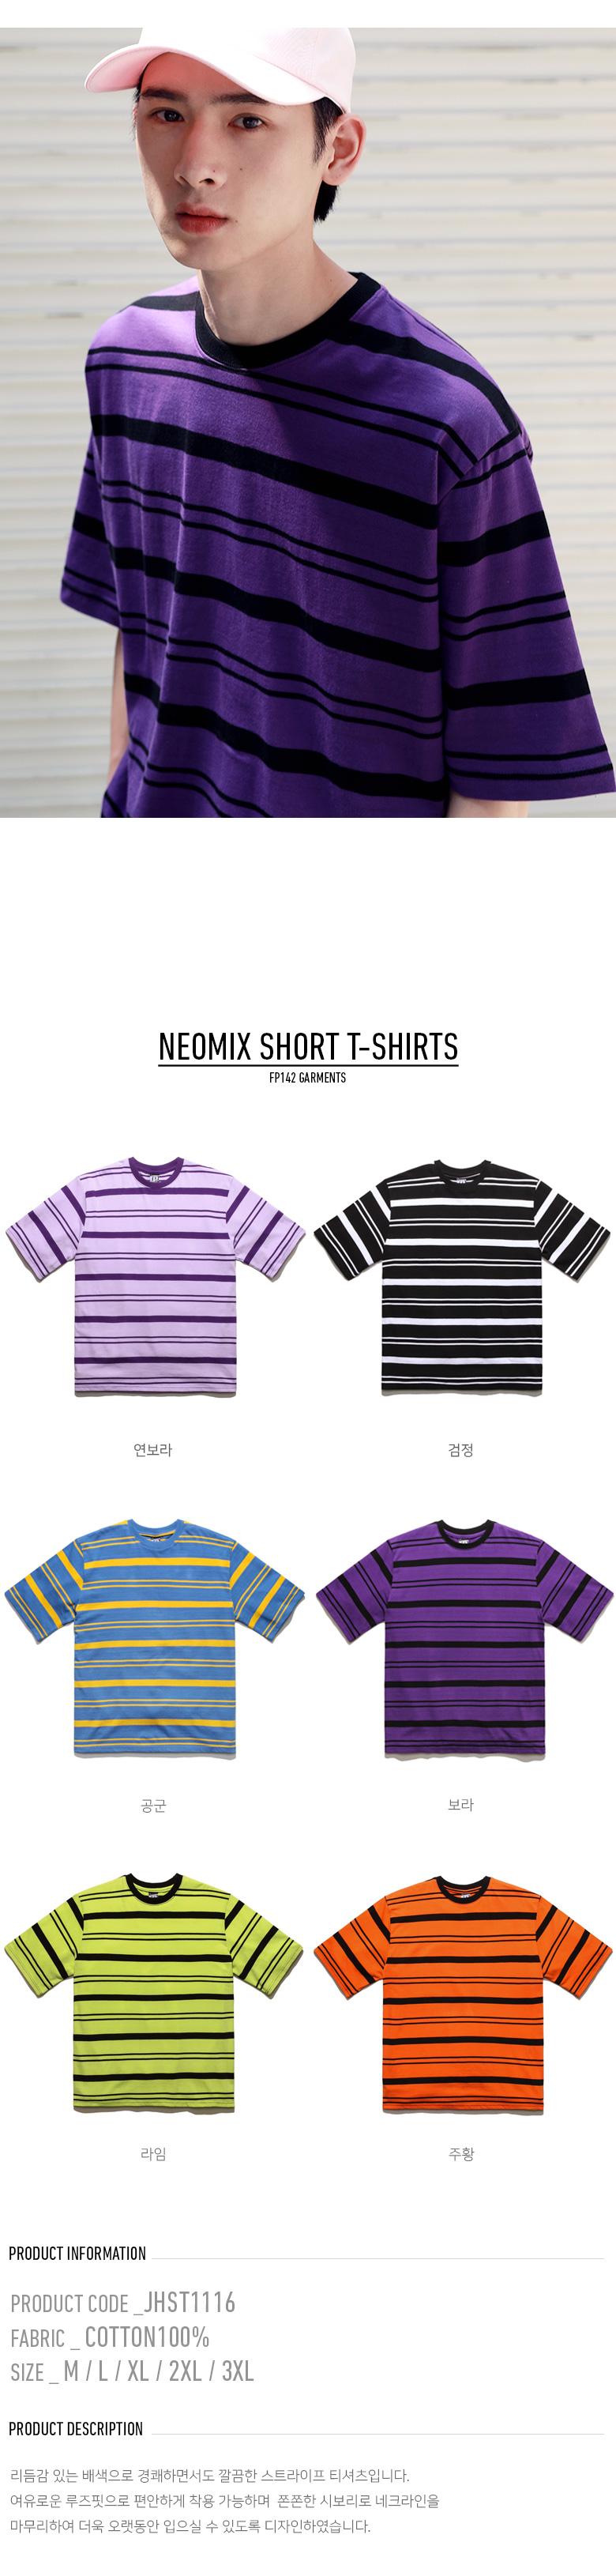 20190524_fp_neomix_shirts_title_JHST1116.jpg